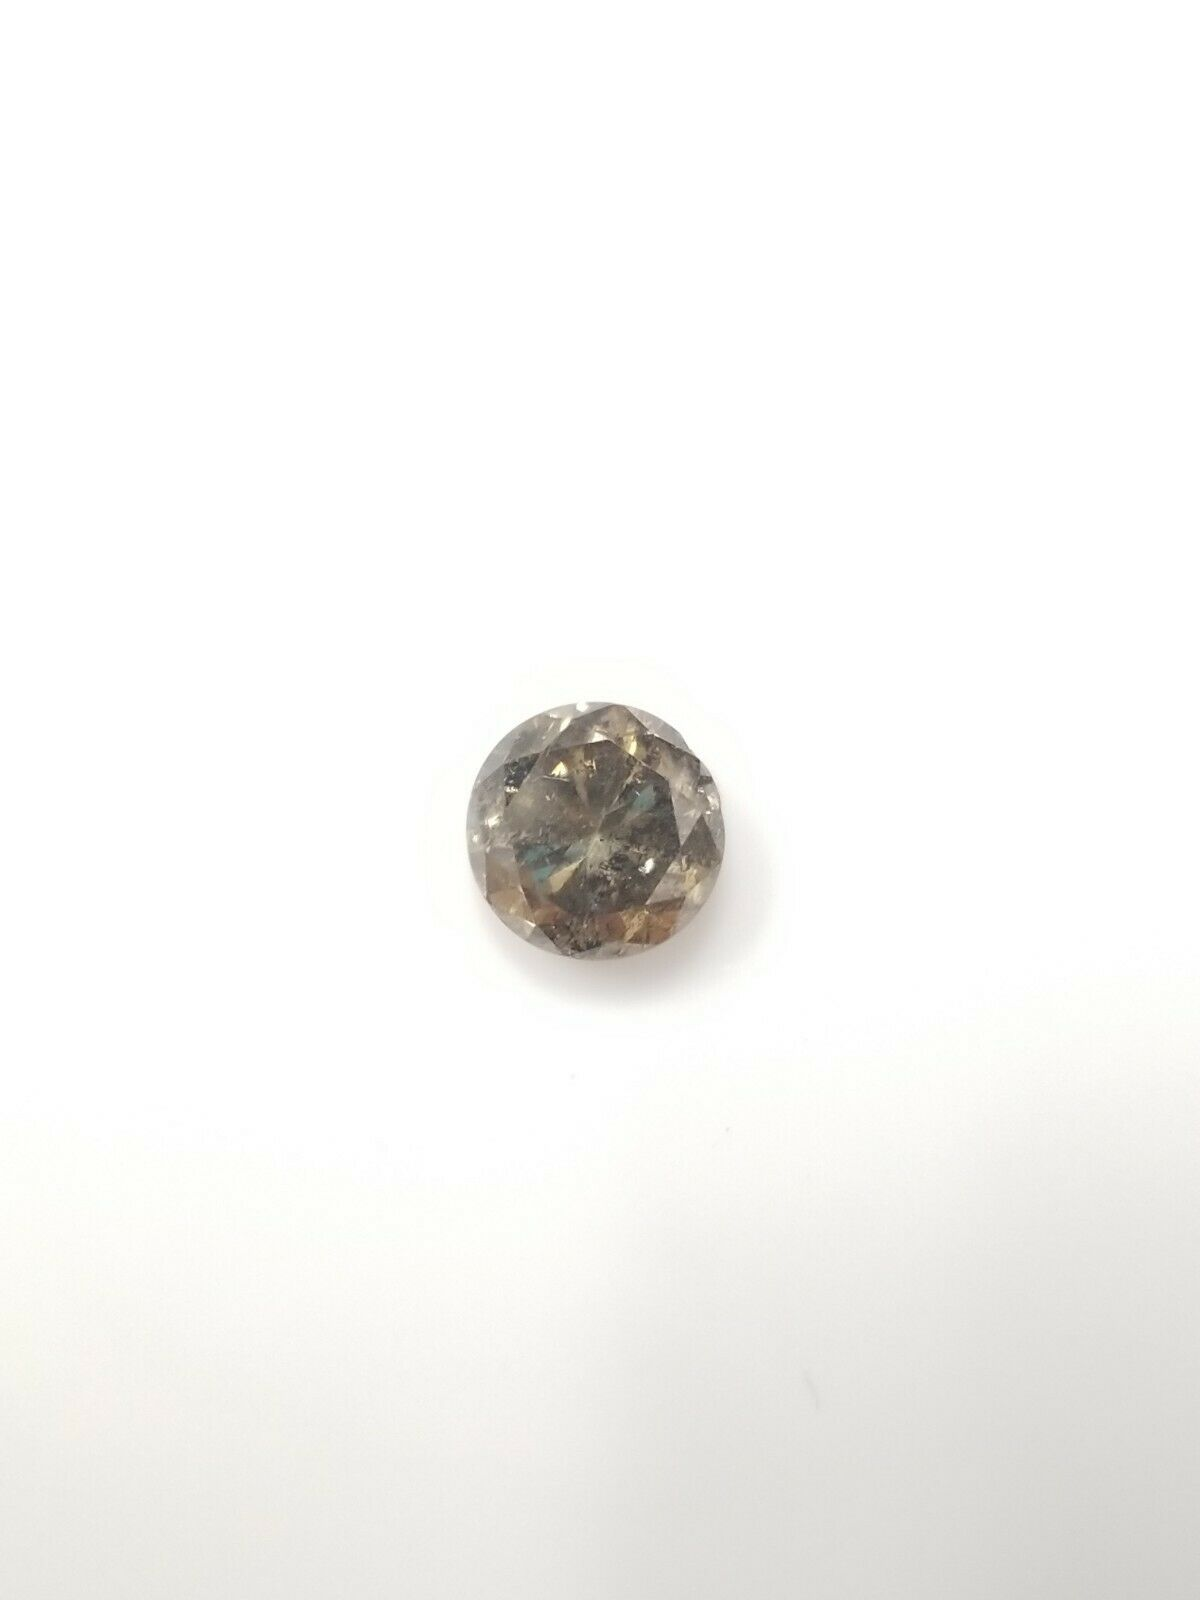 1.13 CT Round Fancy Dark Yellowish Brown Loose Diamond! GIA